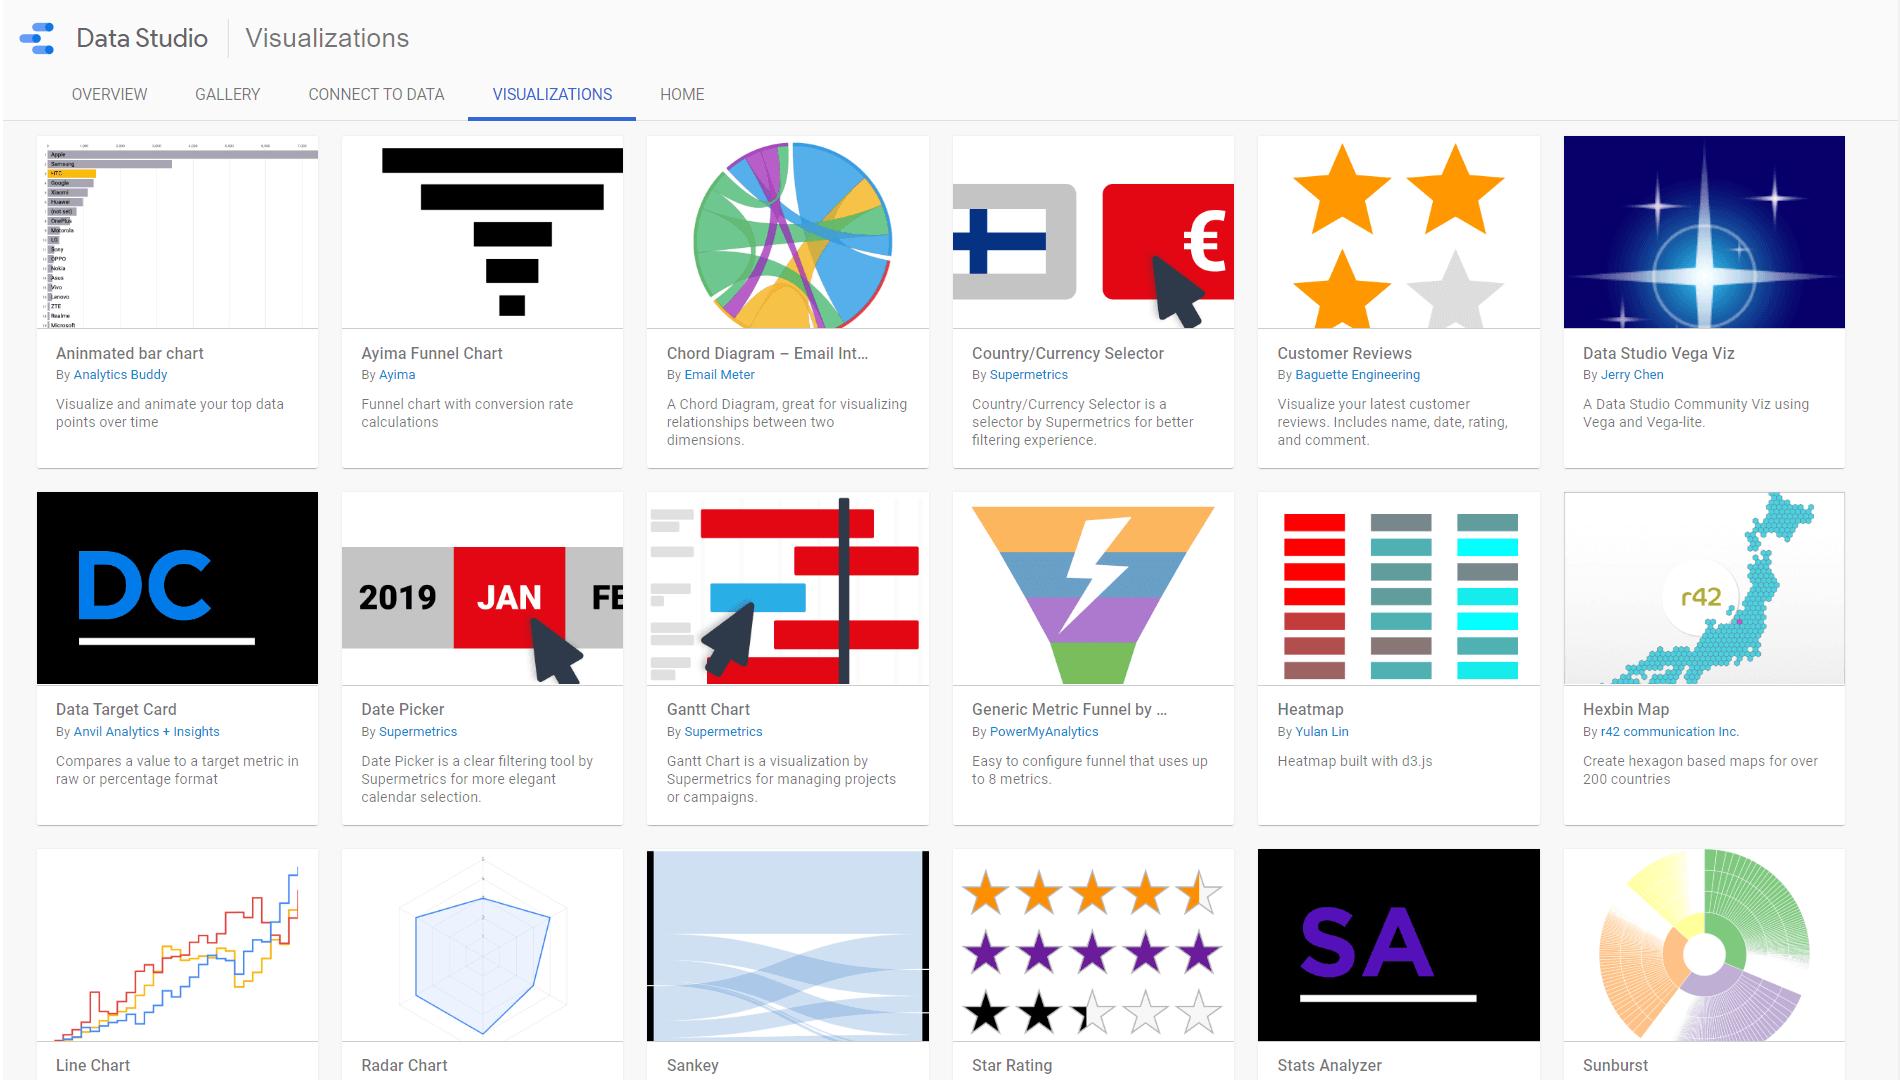 Community visualizations - Google Data Studio news